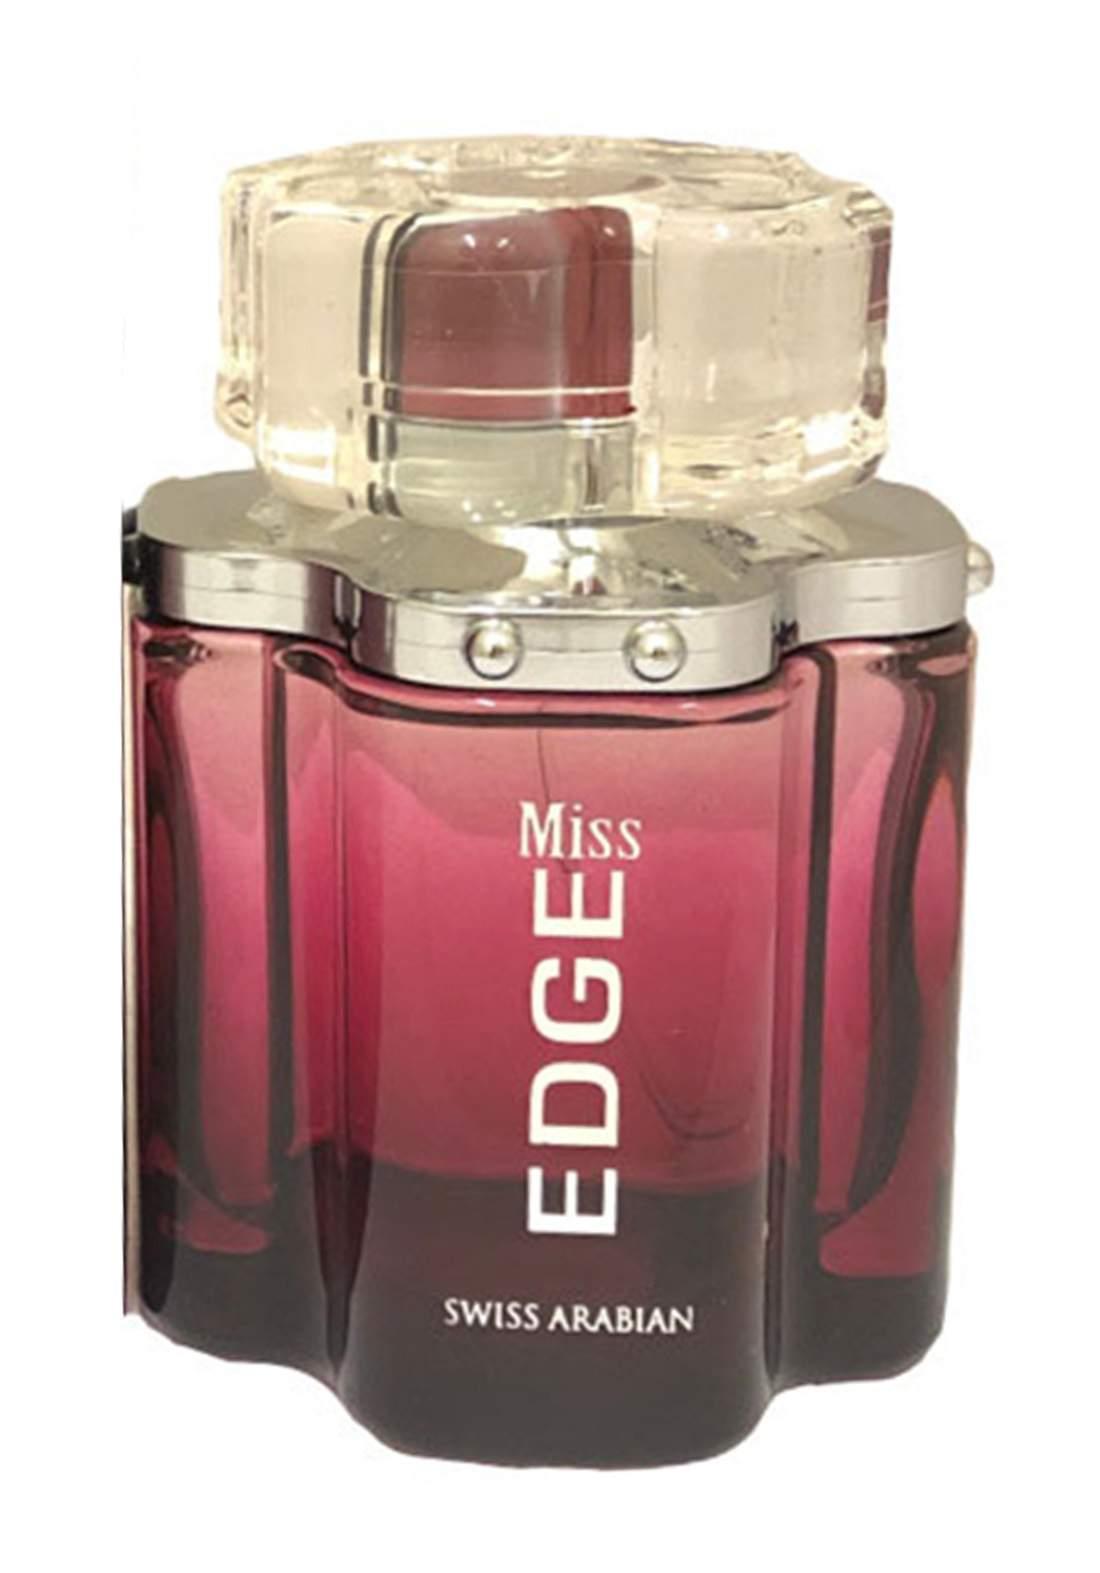 swiss Arabian 984 Miss Edge EDP spray for women 100 ml عطر نسائي